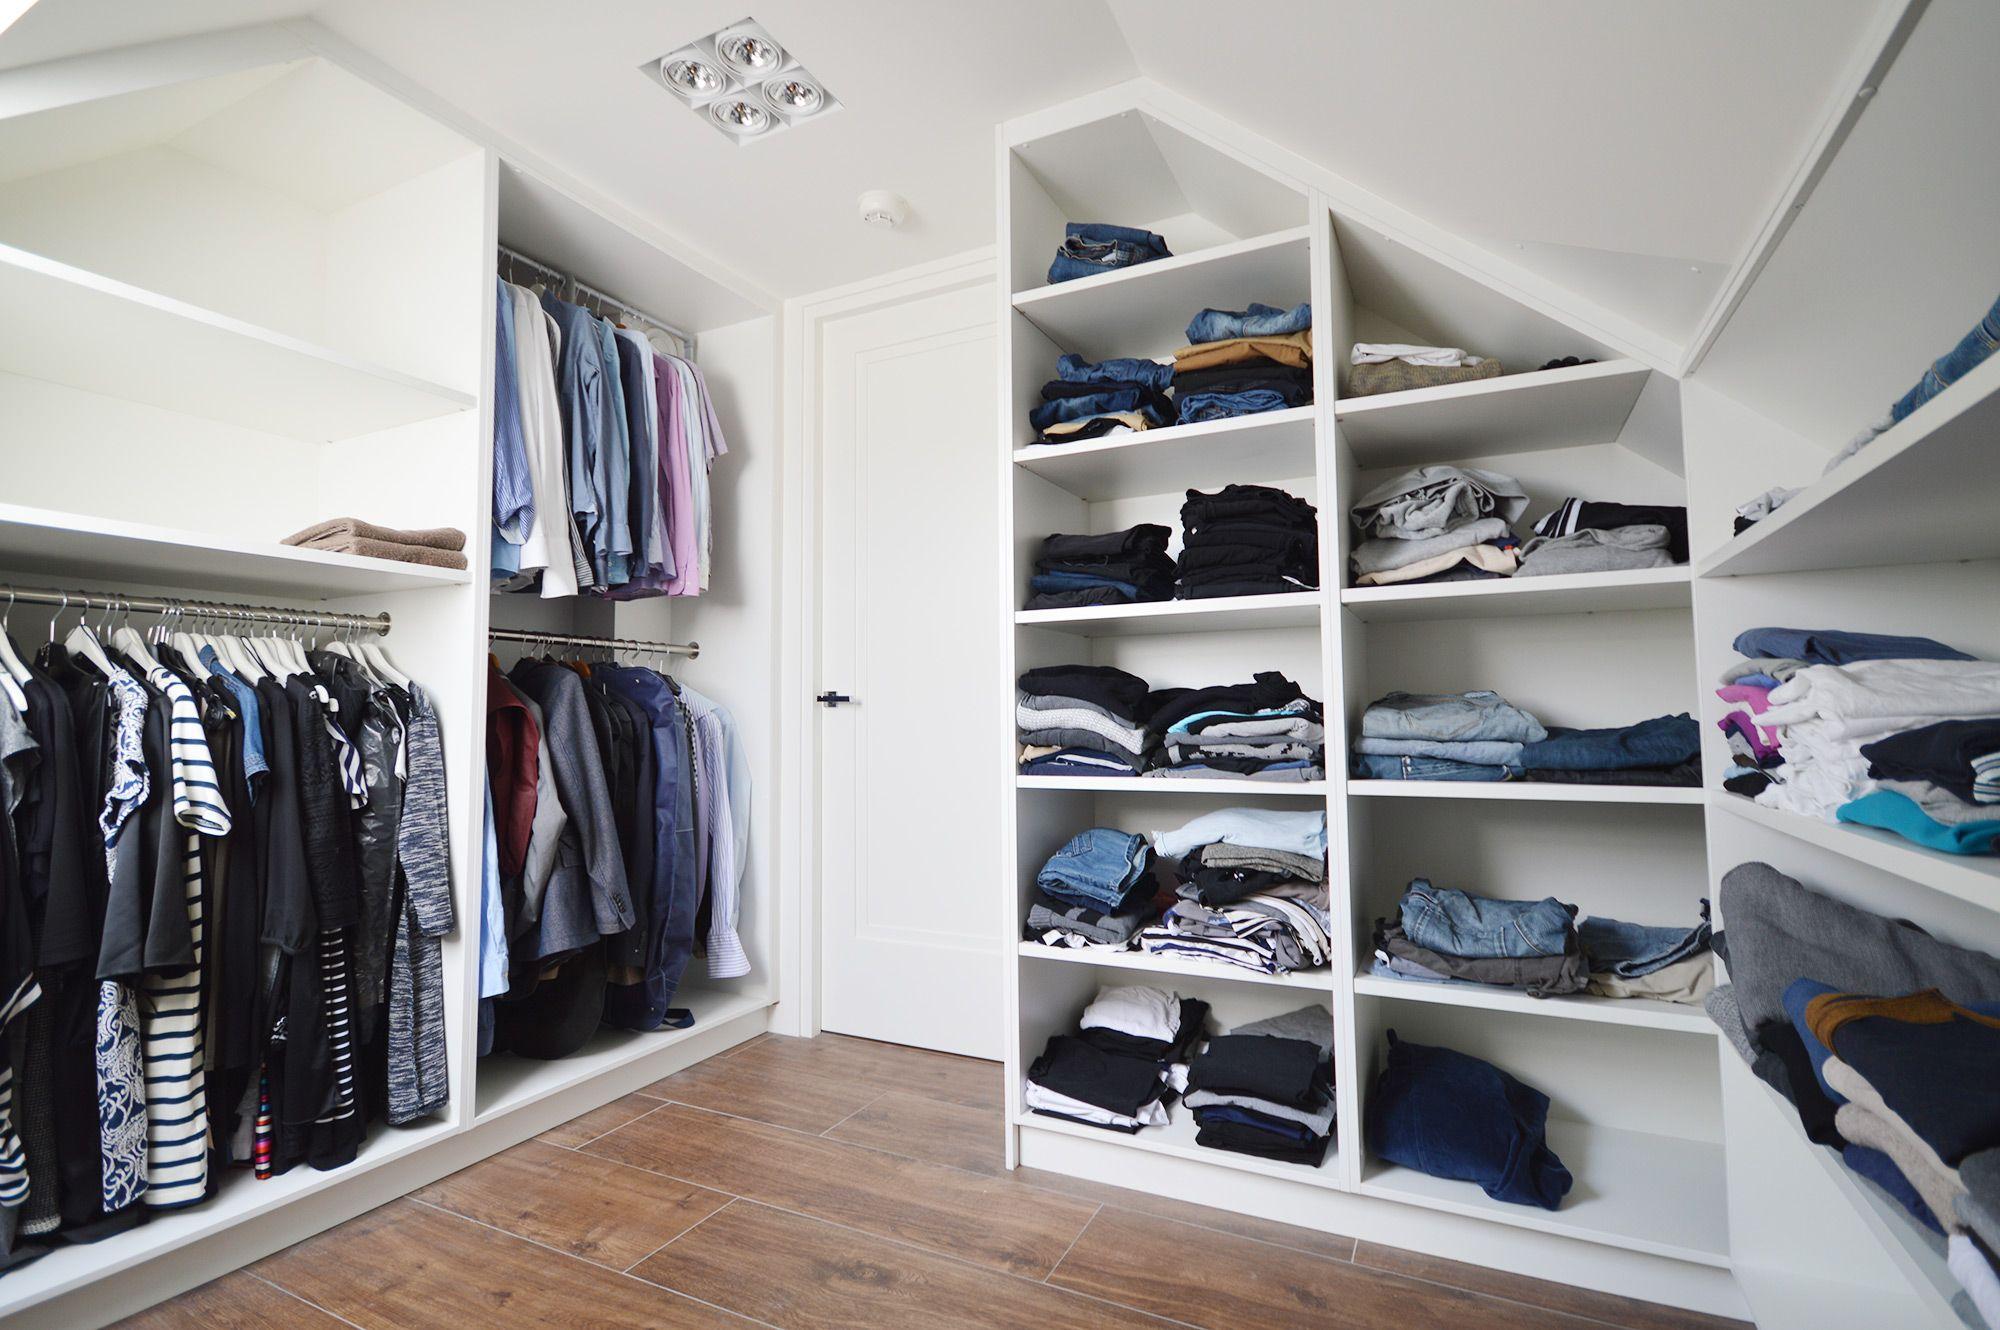 Eiken Ikea Inloopkast : Ikea inloopkasten walk in closet pinterest walk in wardrobe